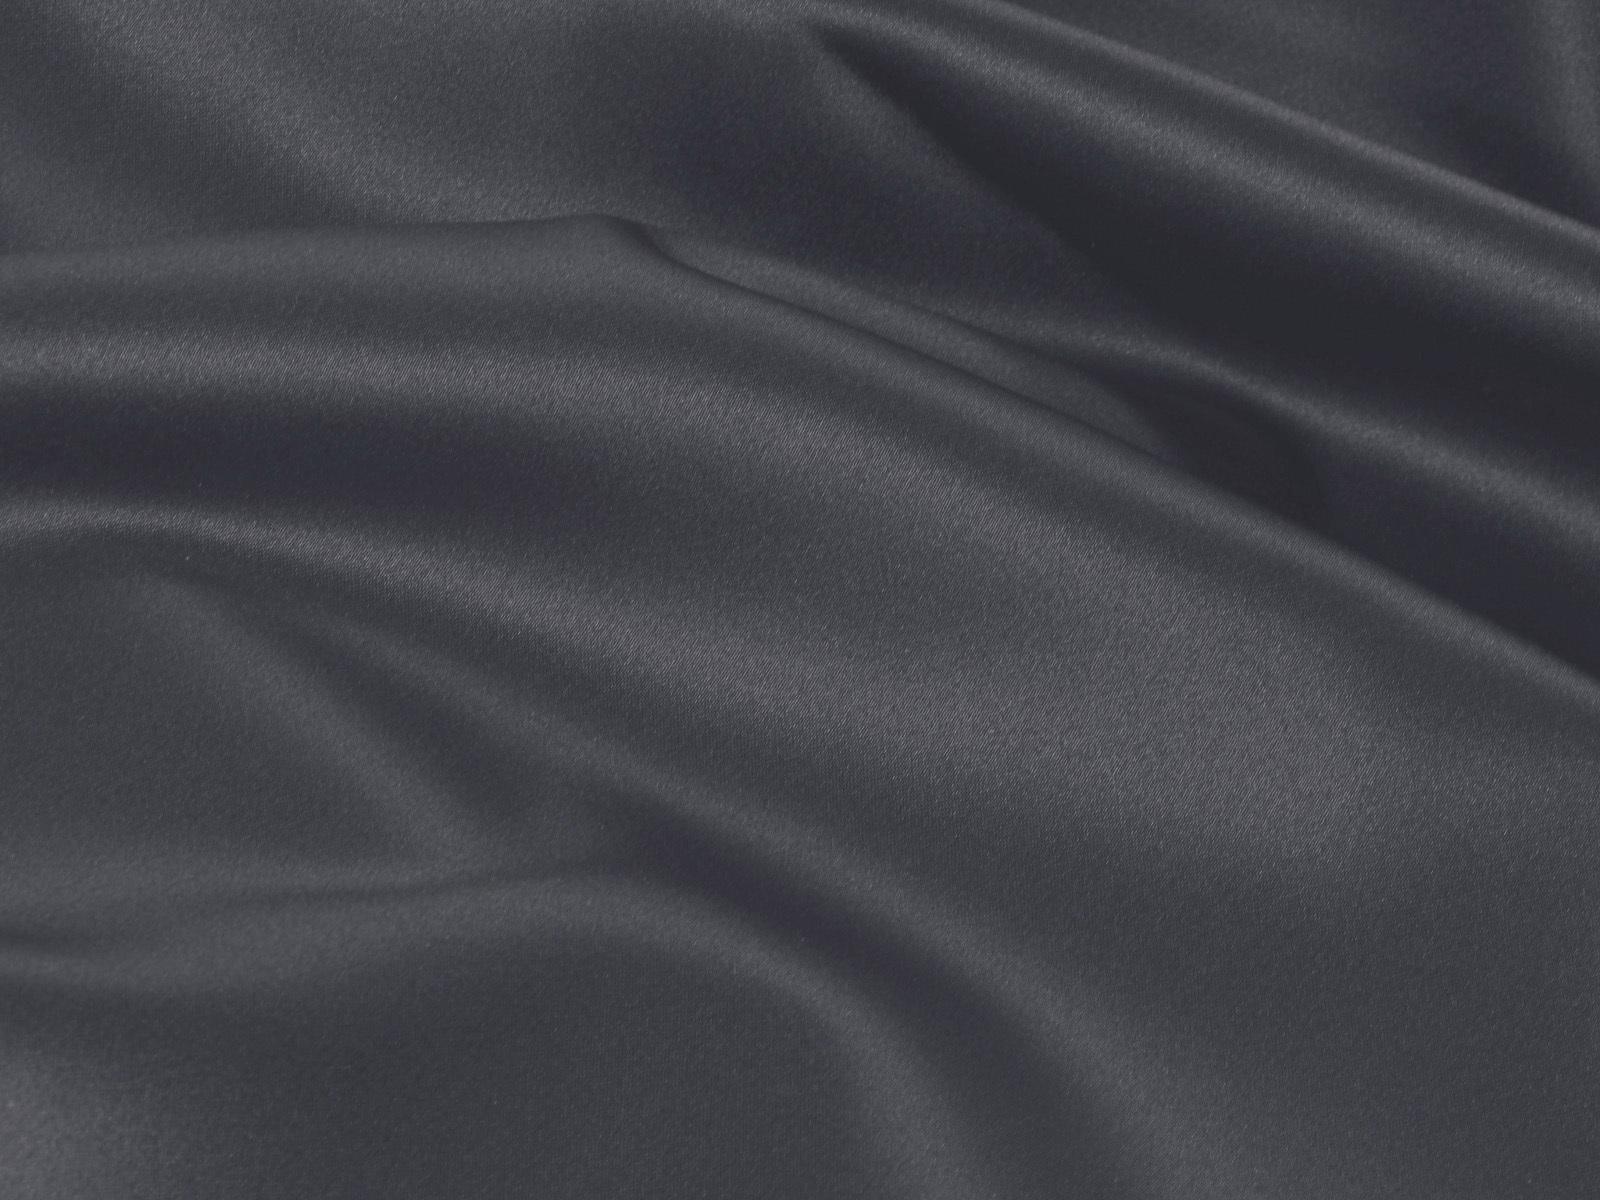 Длинные шторы. Classic Blackout (Silver). Однотонный блэкаут